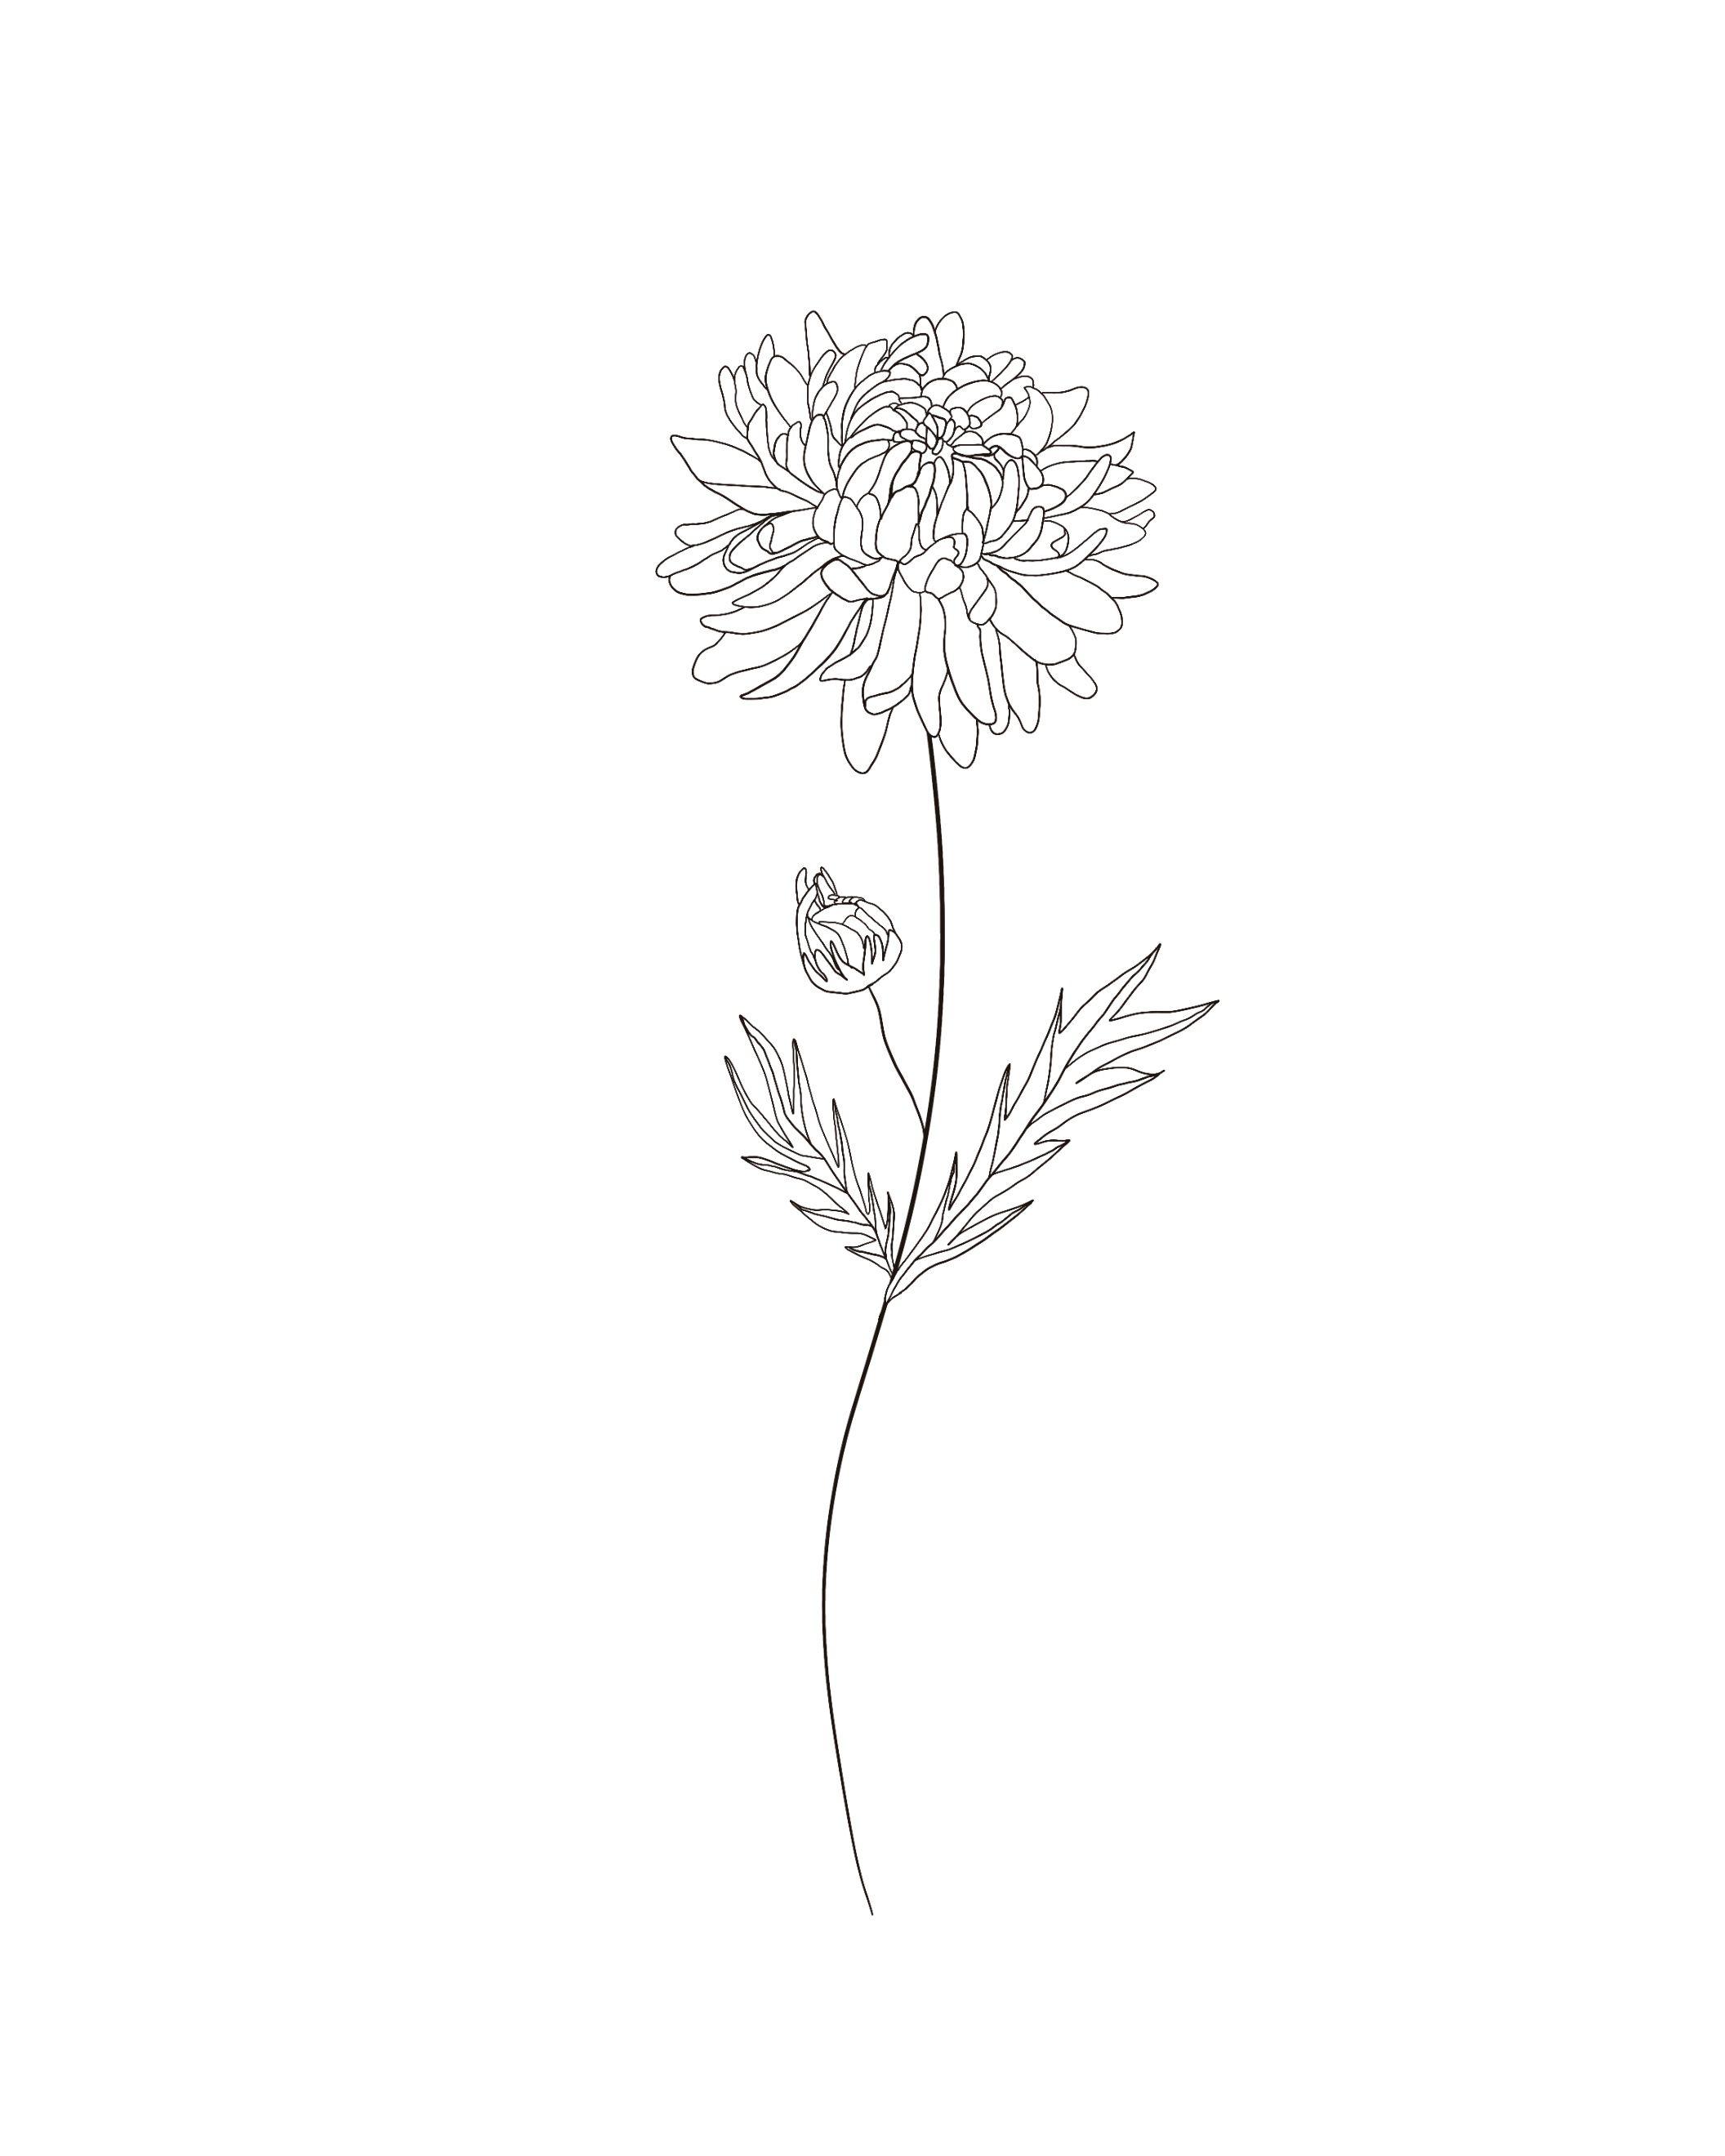 Birth Month Flowers Chrysanthemum November In 2020 Body Art Tattoos Birth Month Flowers Tattoos